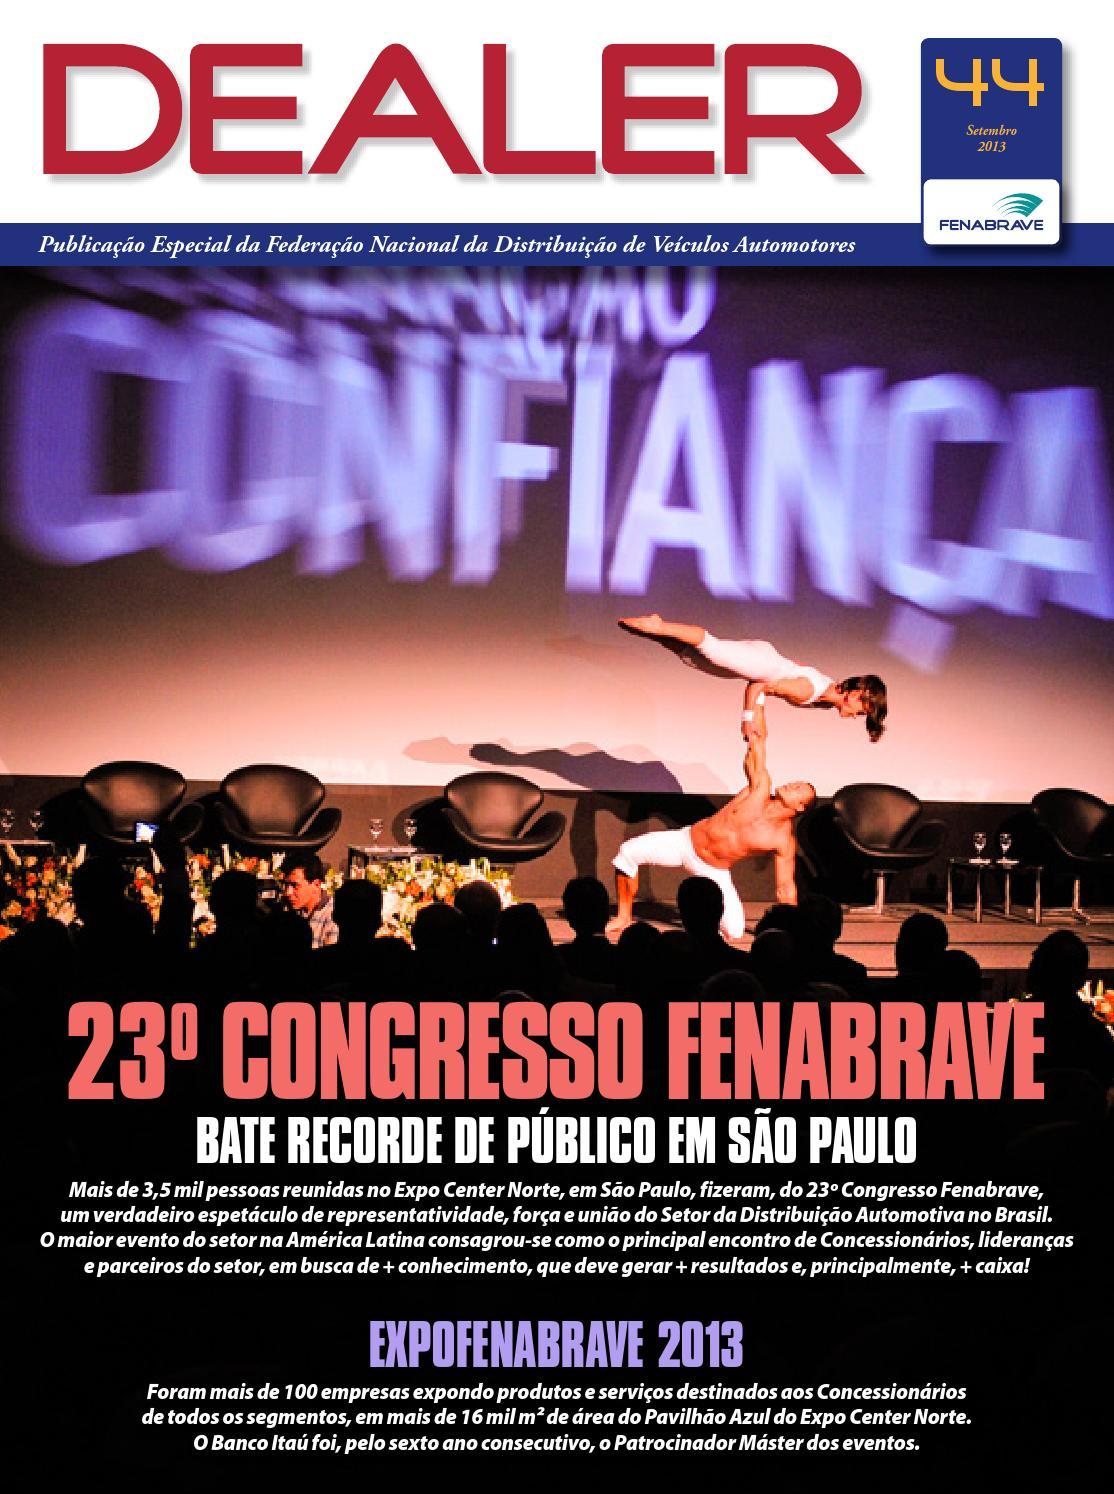 85457681f6107 Revista Dealer - Ed44 - Português by Fenabrave mcepress - issuu